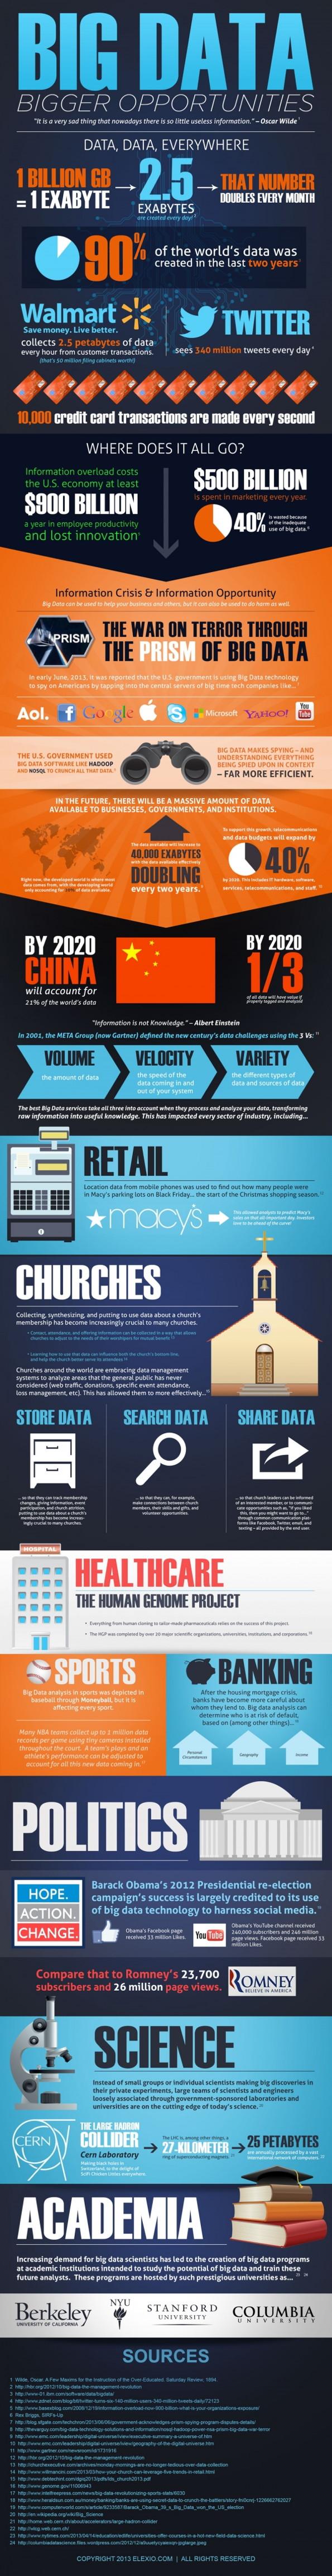 Big-Data-Infographic-Cloud